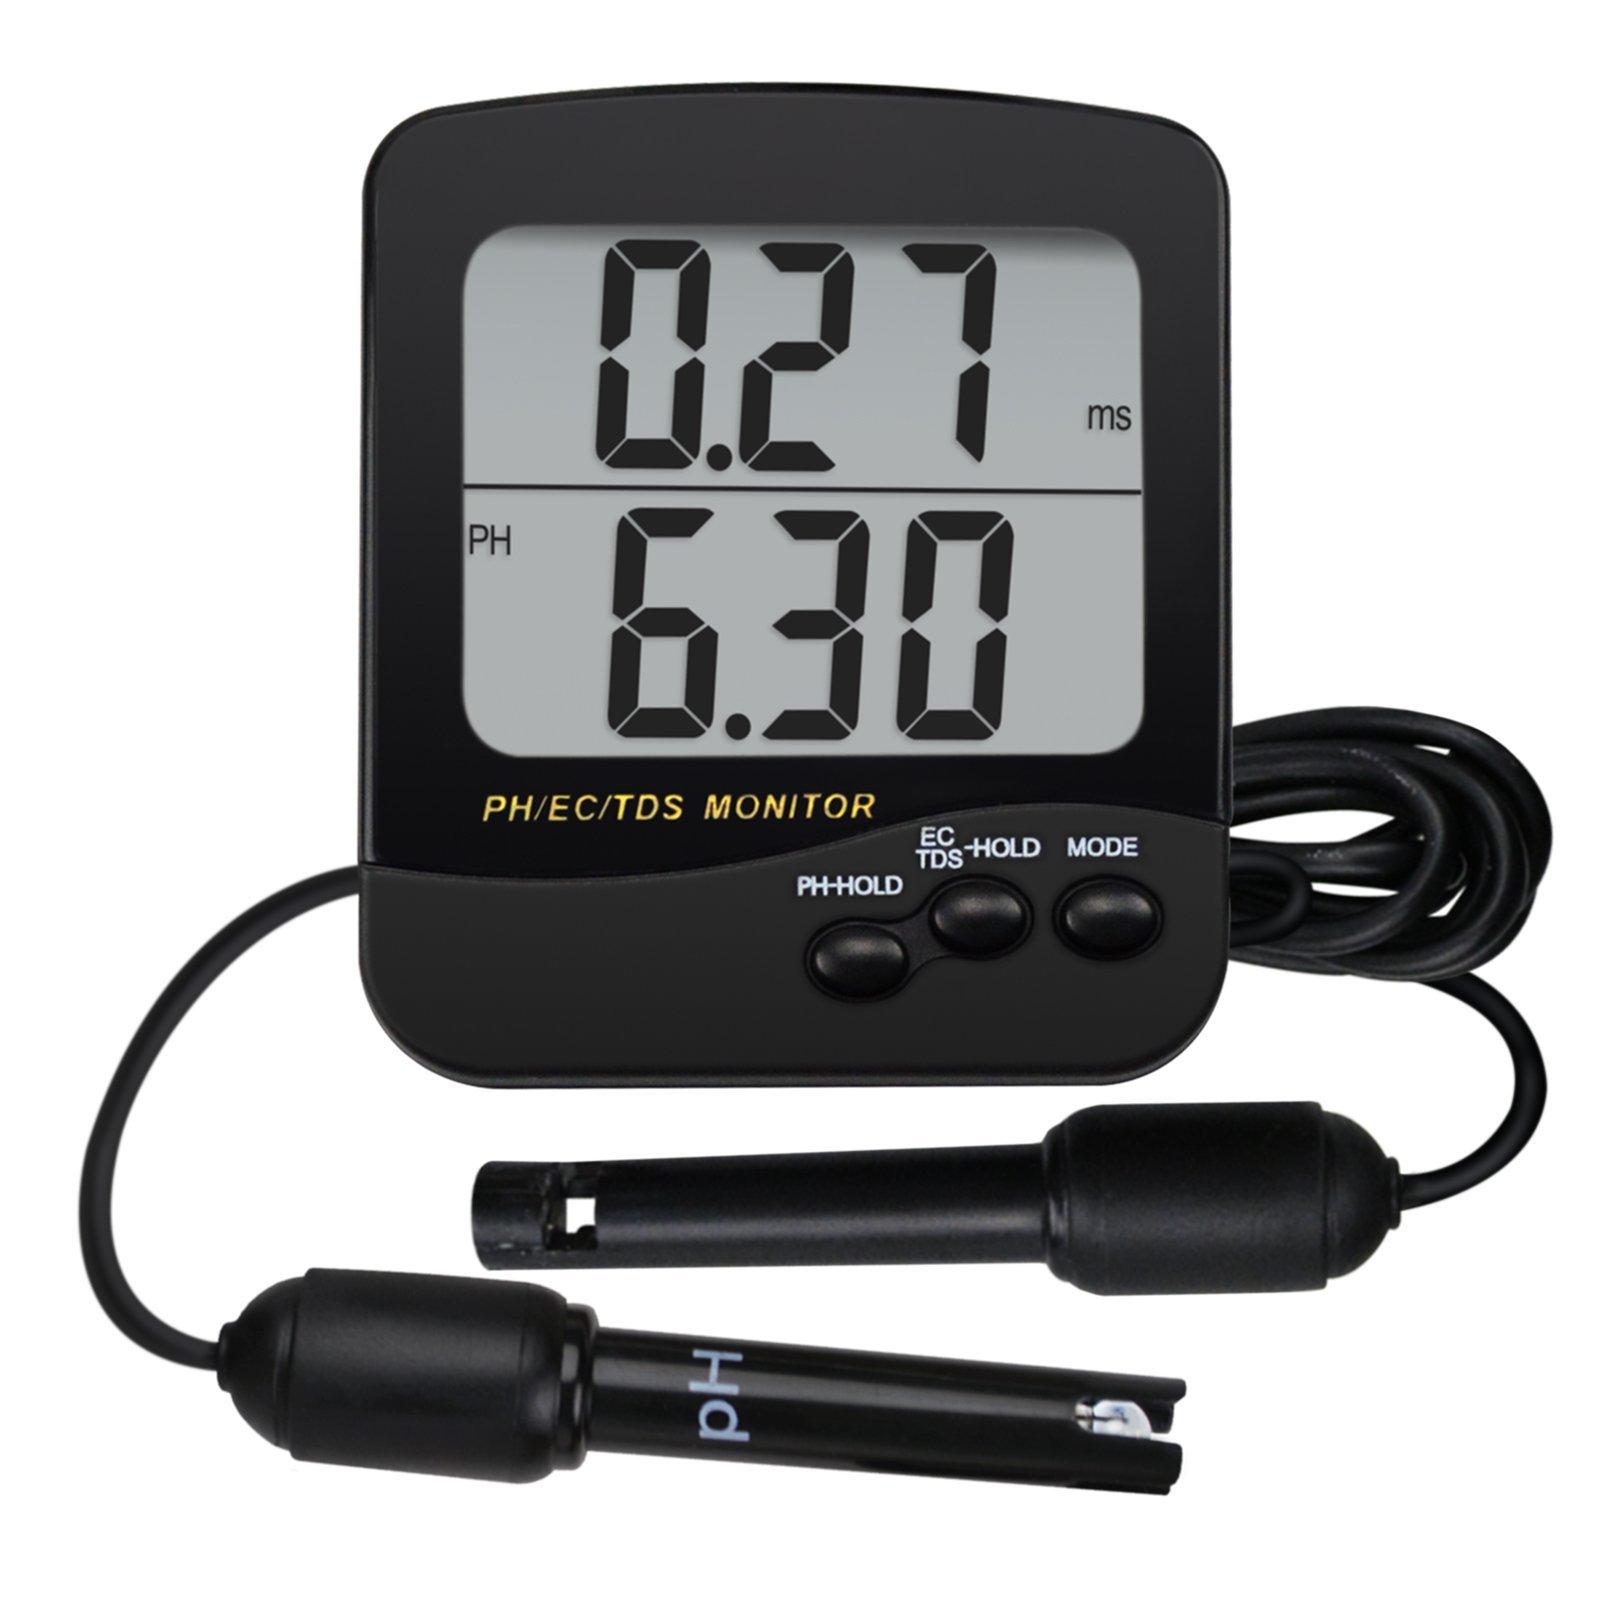 3-in-1 pH, EC & TDS Conductivity Monitor ATC w/ 3.5'' Large Dual Display, Digital Water Quality Meter Tester Multi-Parameter, Desktop/Wall Mountable, for Aquaculture, Aquarium, Pond, Hydroponics